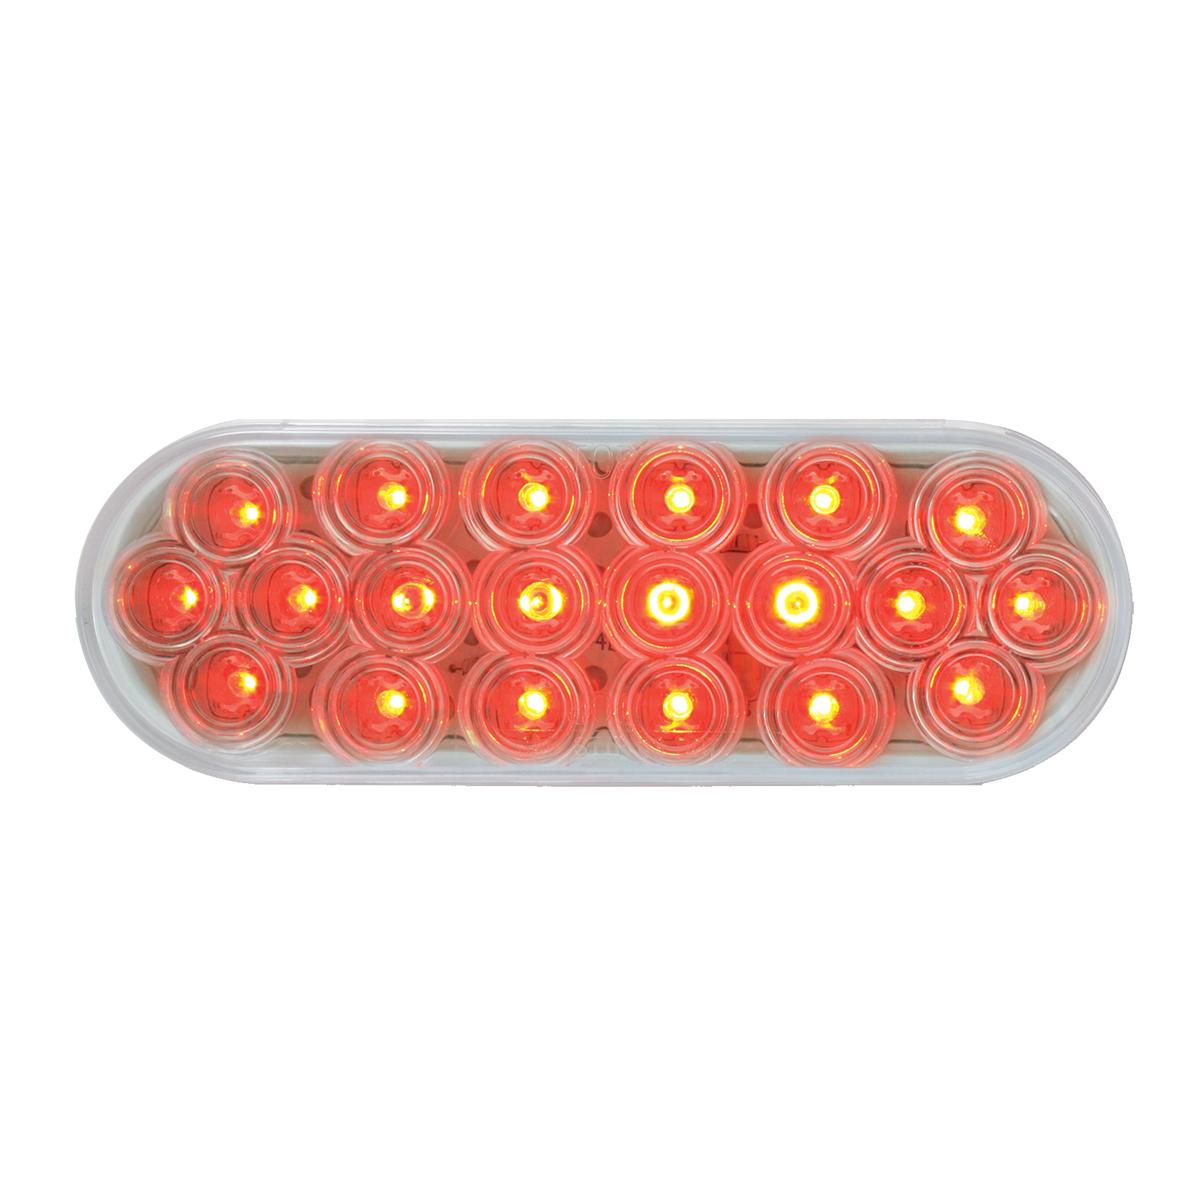 #87729 - Oval Fleet LED Flat Red/Clear Light - Slanted